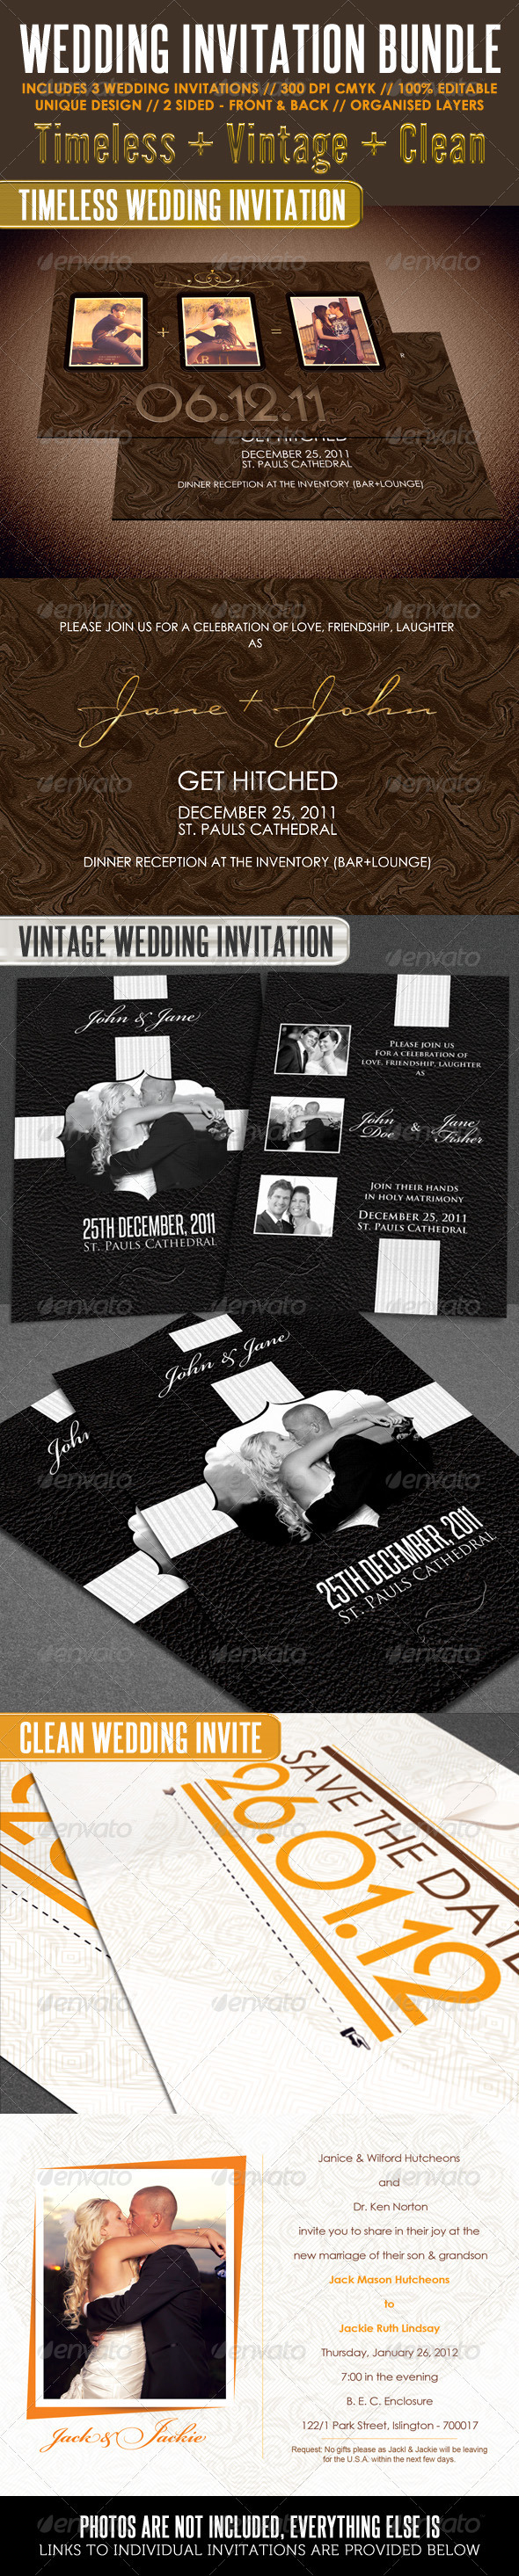 Wedding Invitation Bundle - Weddings Cards & Invites